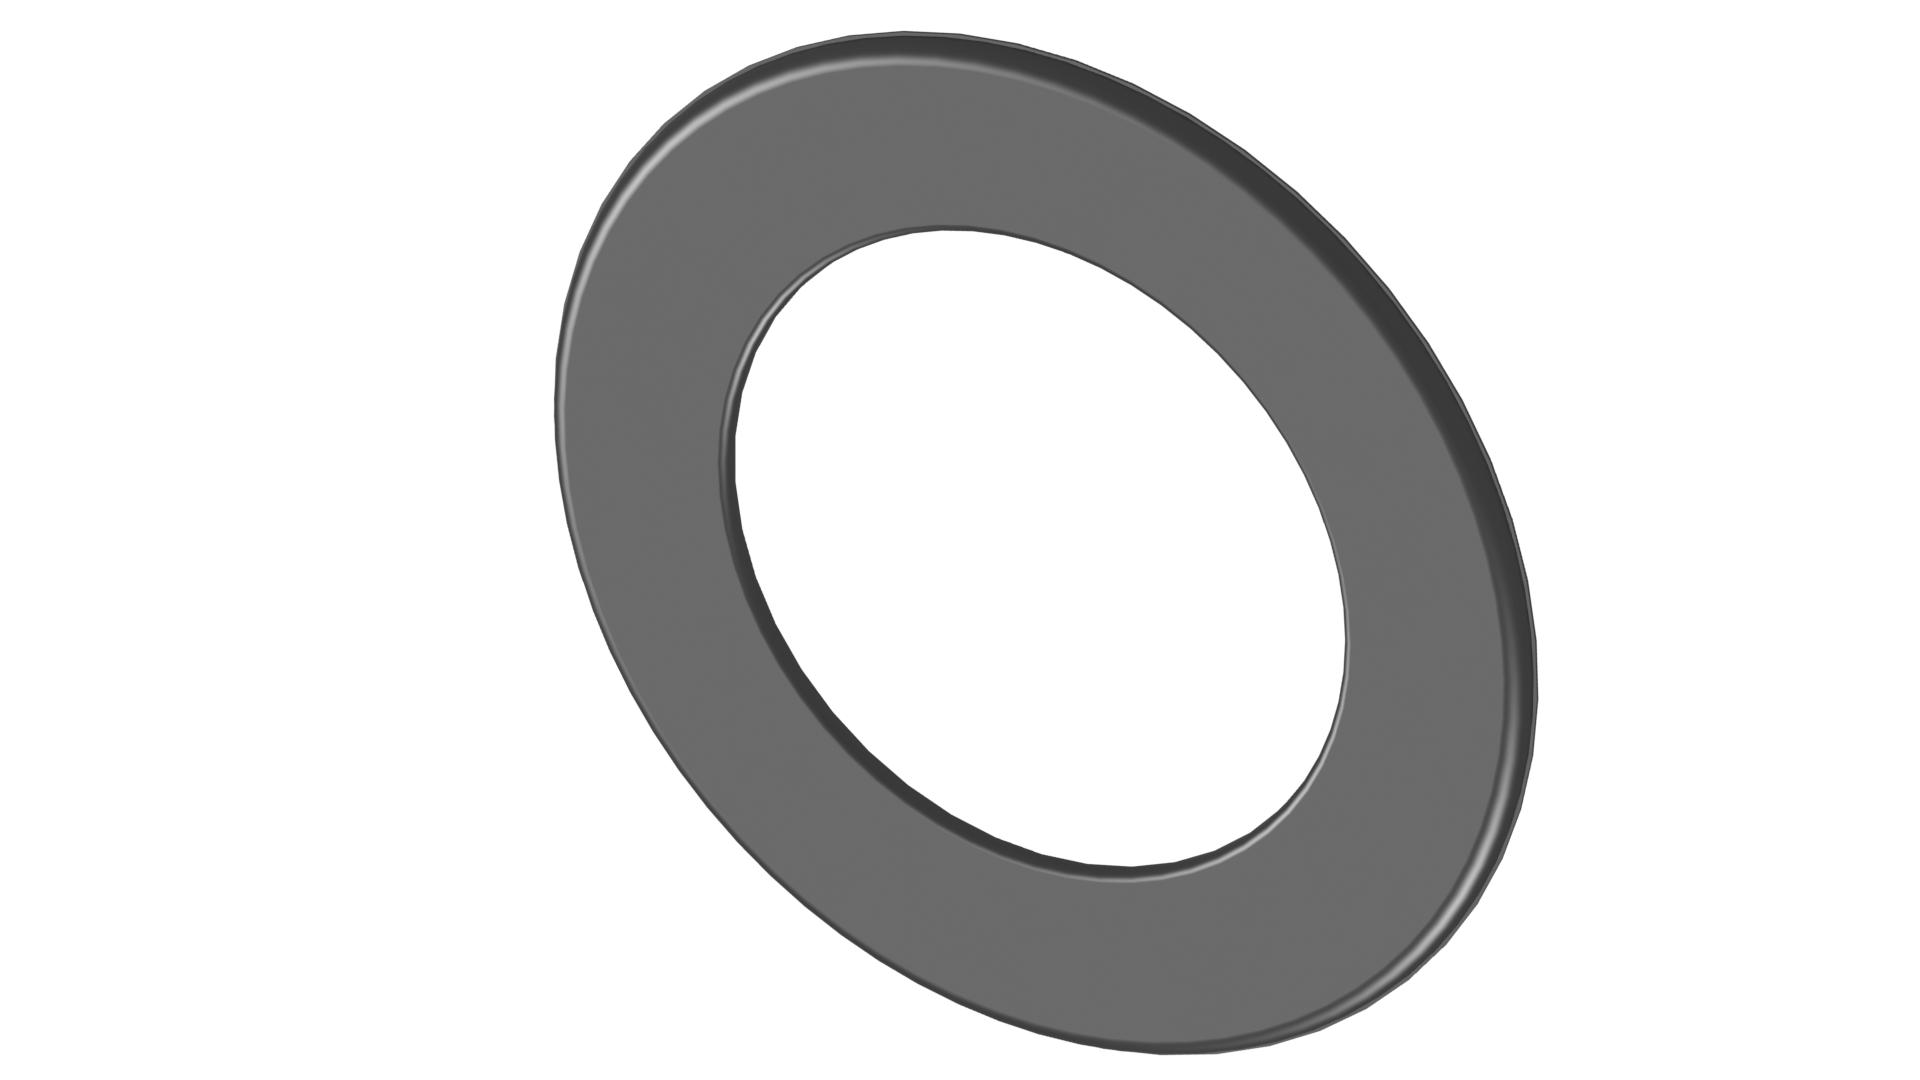 Ofenrohr - Wandrosette 55 mm schwarz - Tecnovis TEC-Stahl